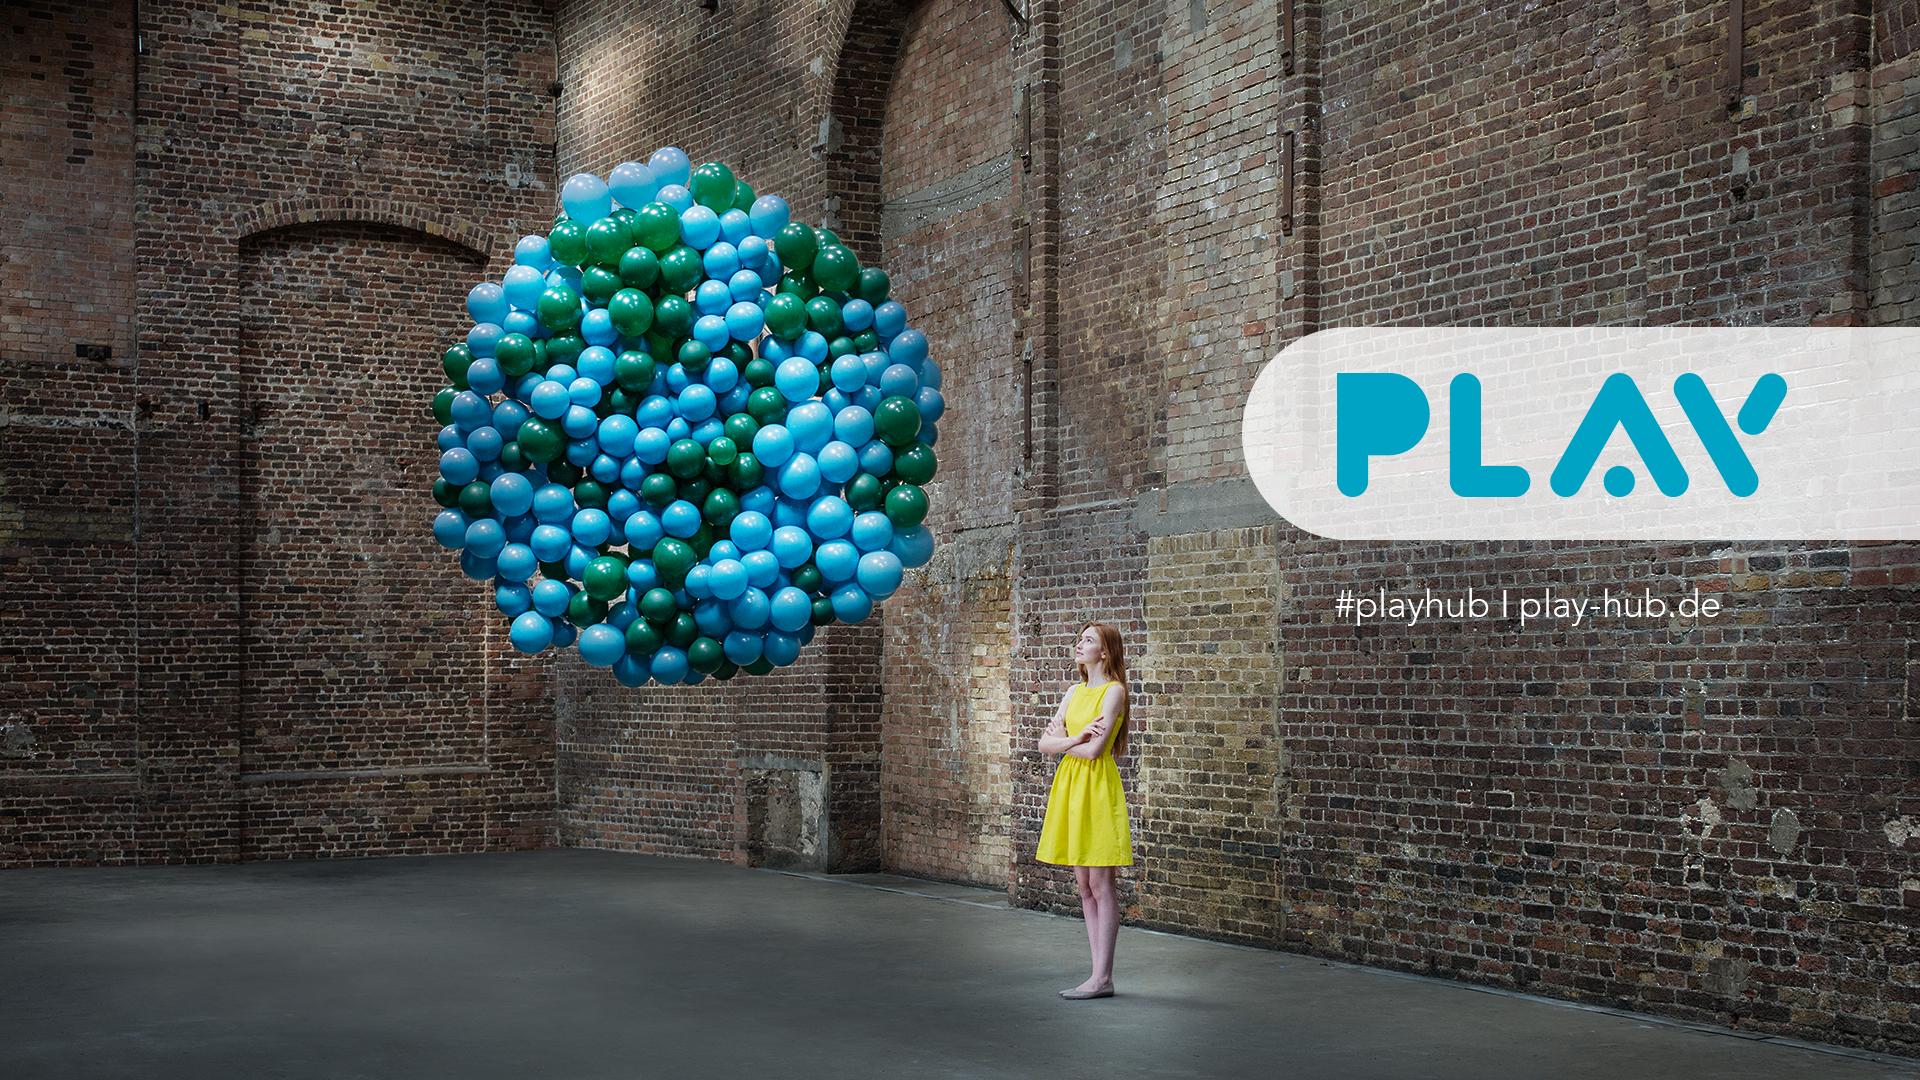 Sky Play Open Innovation Hub